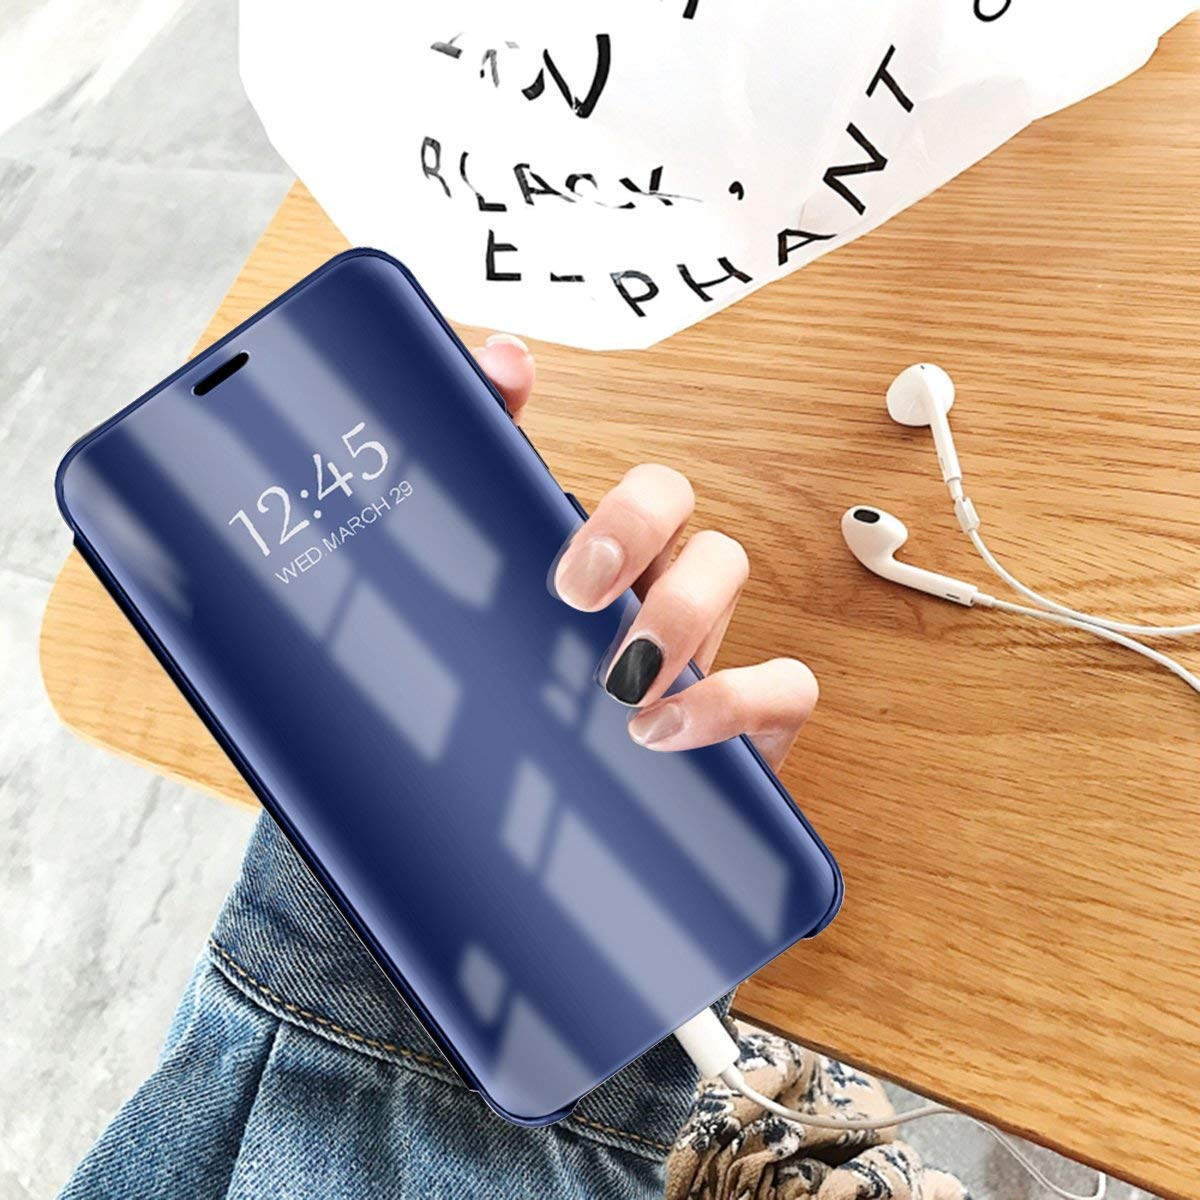 Gold Caler Kompatibel Huawei Honor Play H/ülle Spiegel Cover Case Flip Schutzh/ülle Clear View Tasche Handyh/ülle mit Handy Ultra PC Mirror Standfunktion D/ünn Sto/ßfest Standing